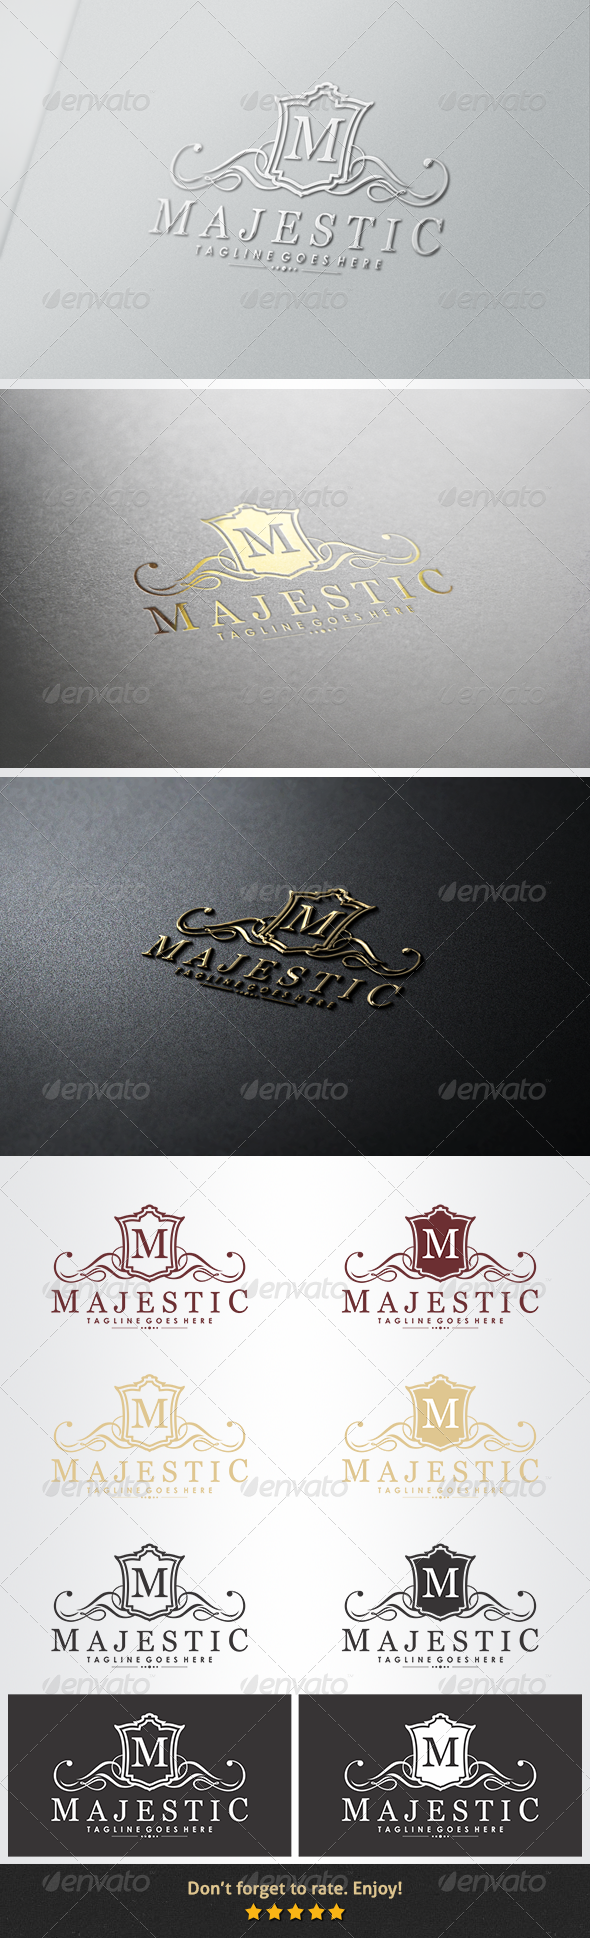 GraphicRiver Majestic Logo 6123275